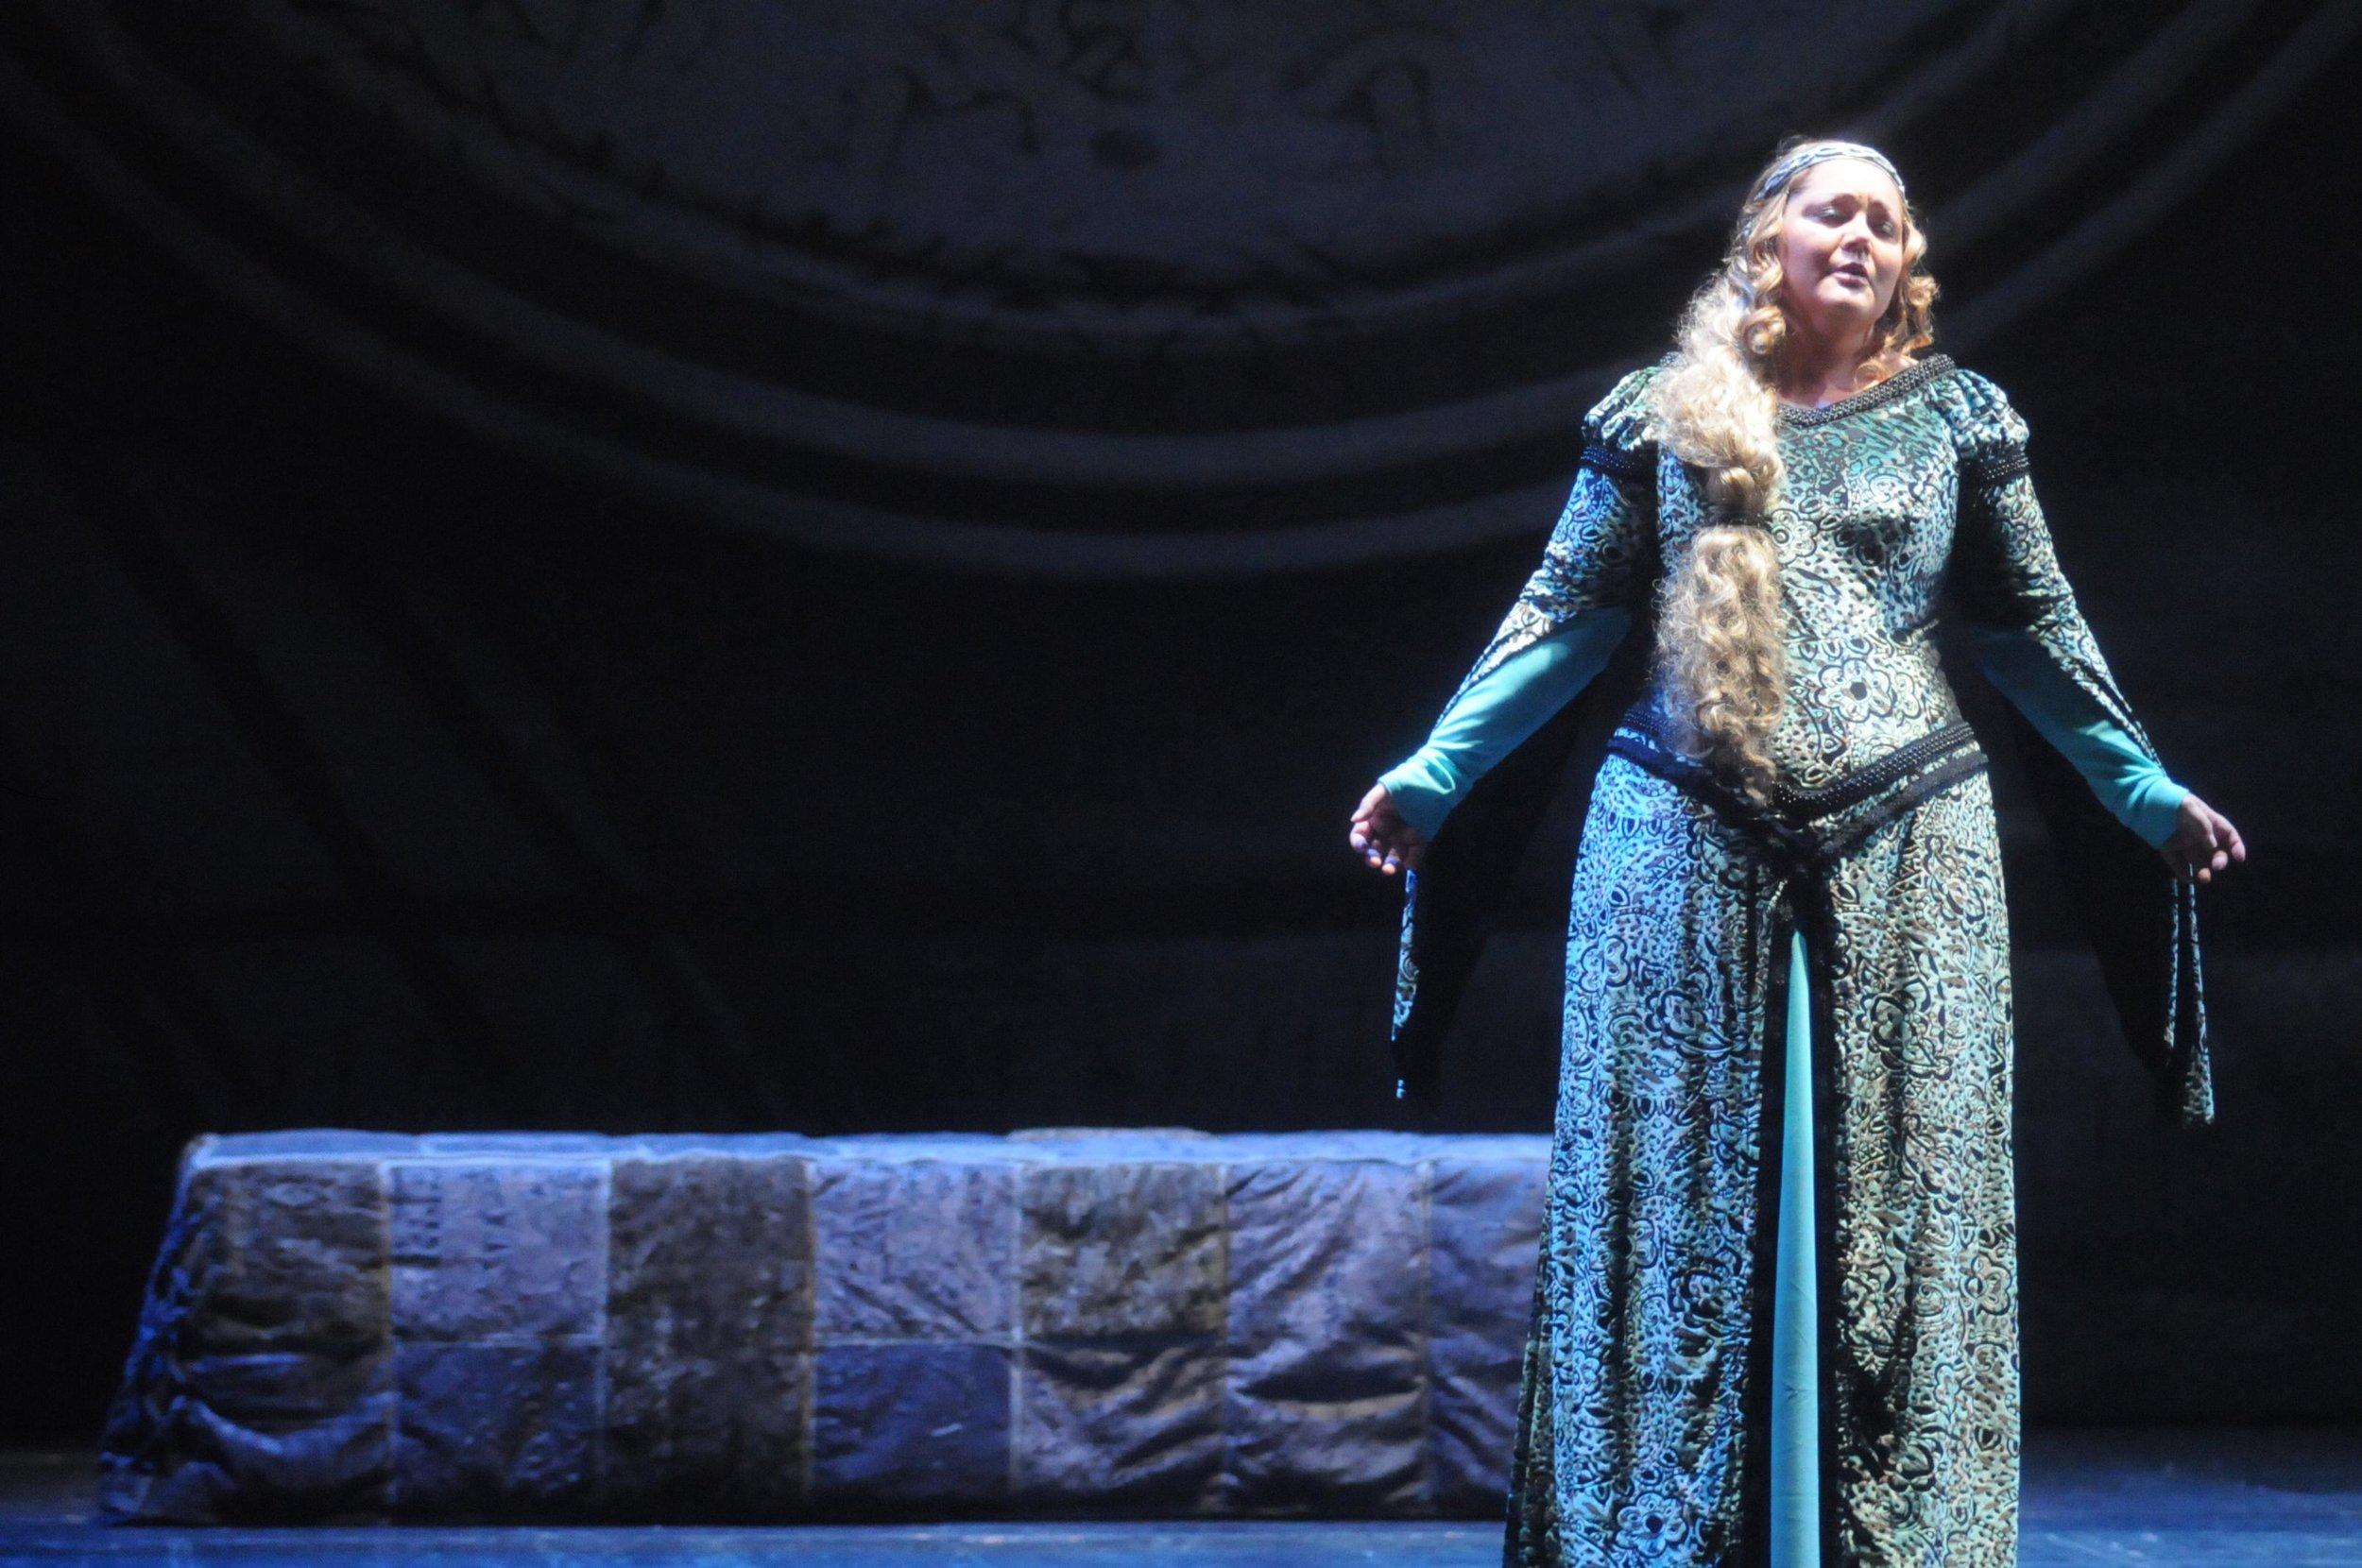 Isolde - Tristan und Isolde - Wagner